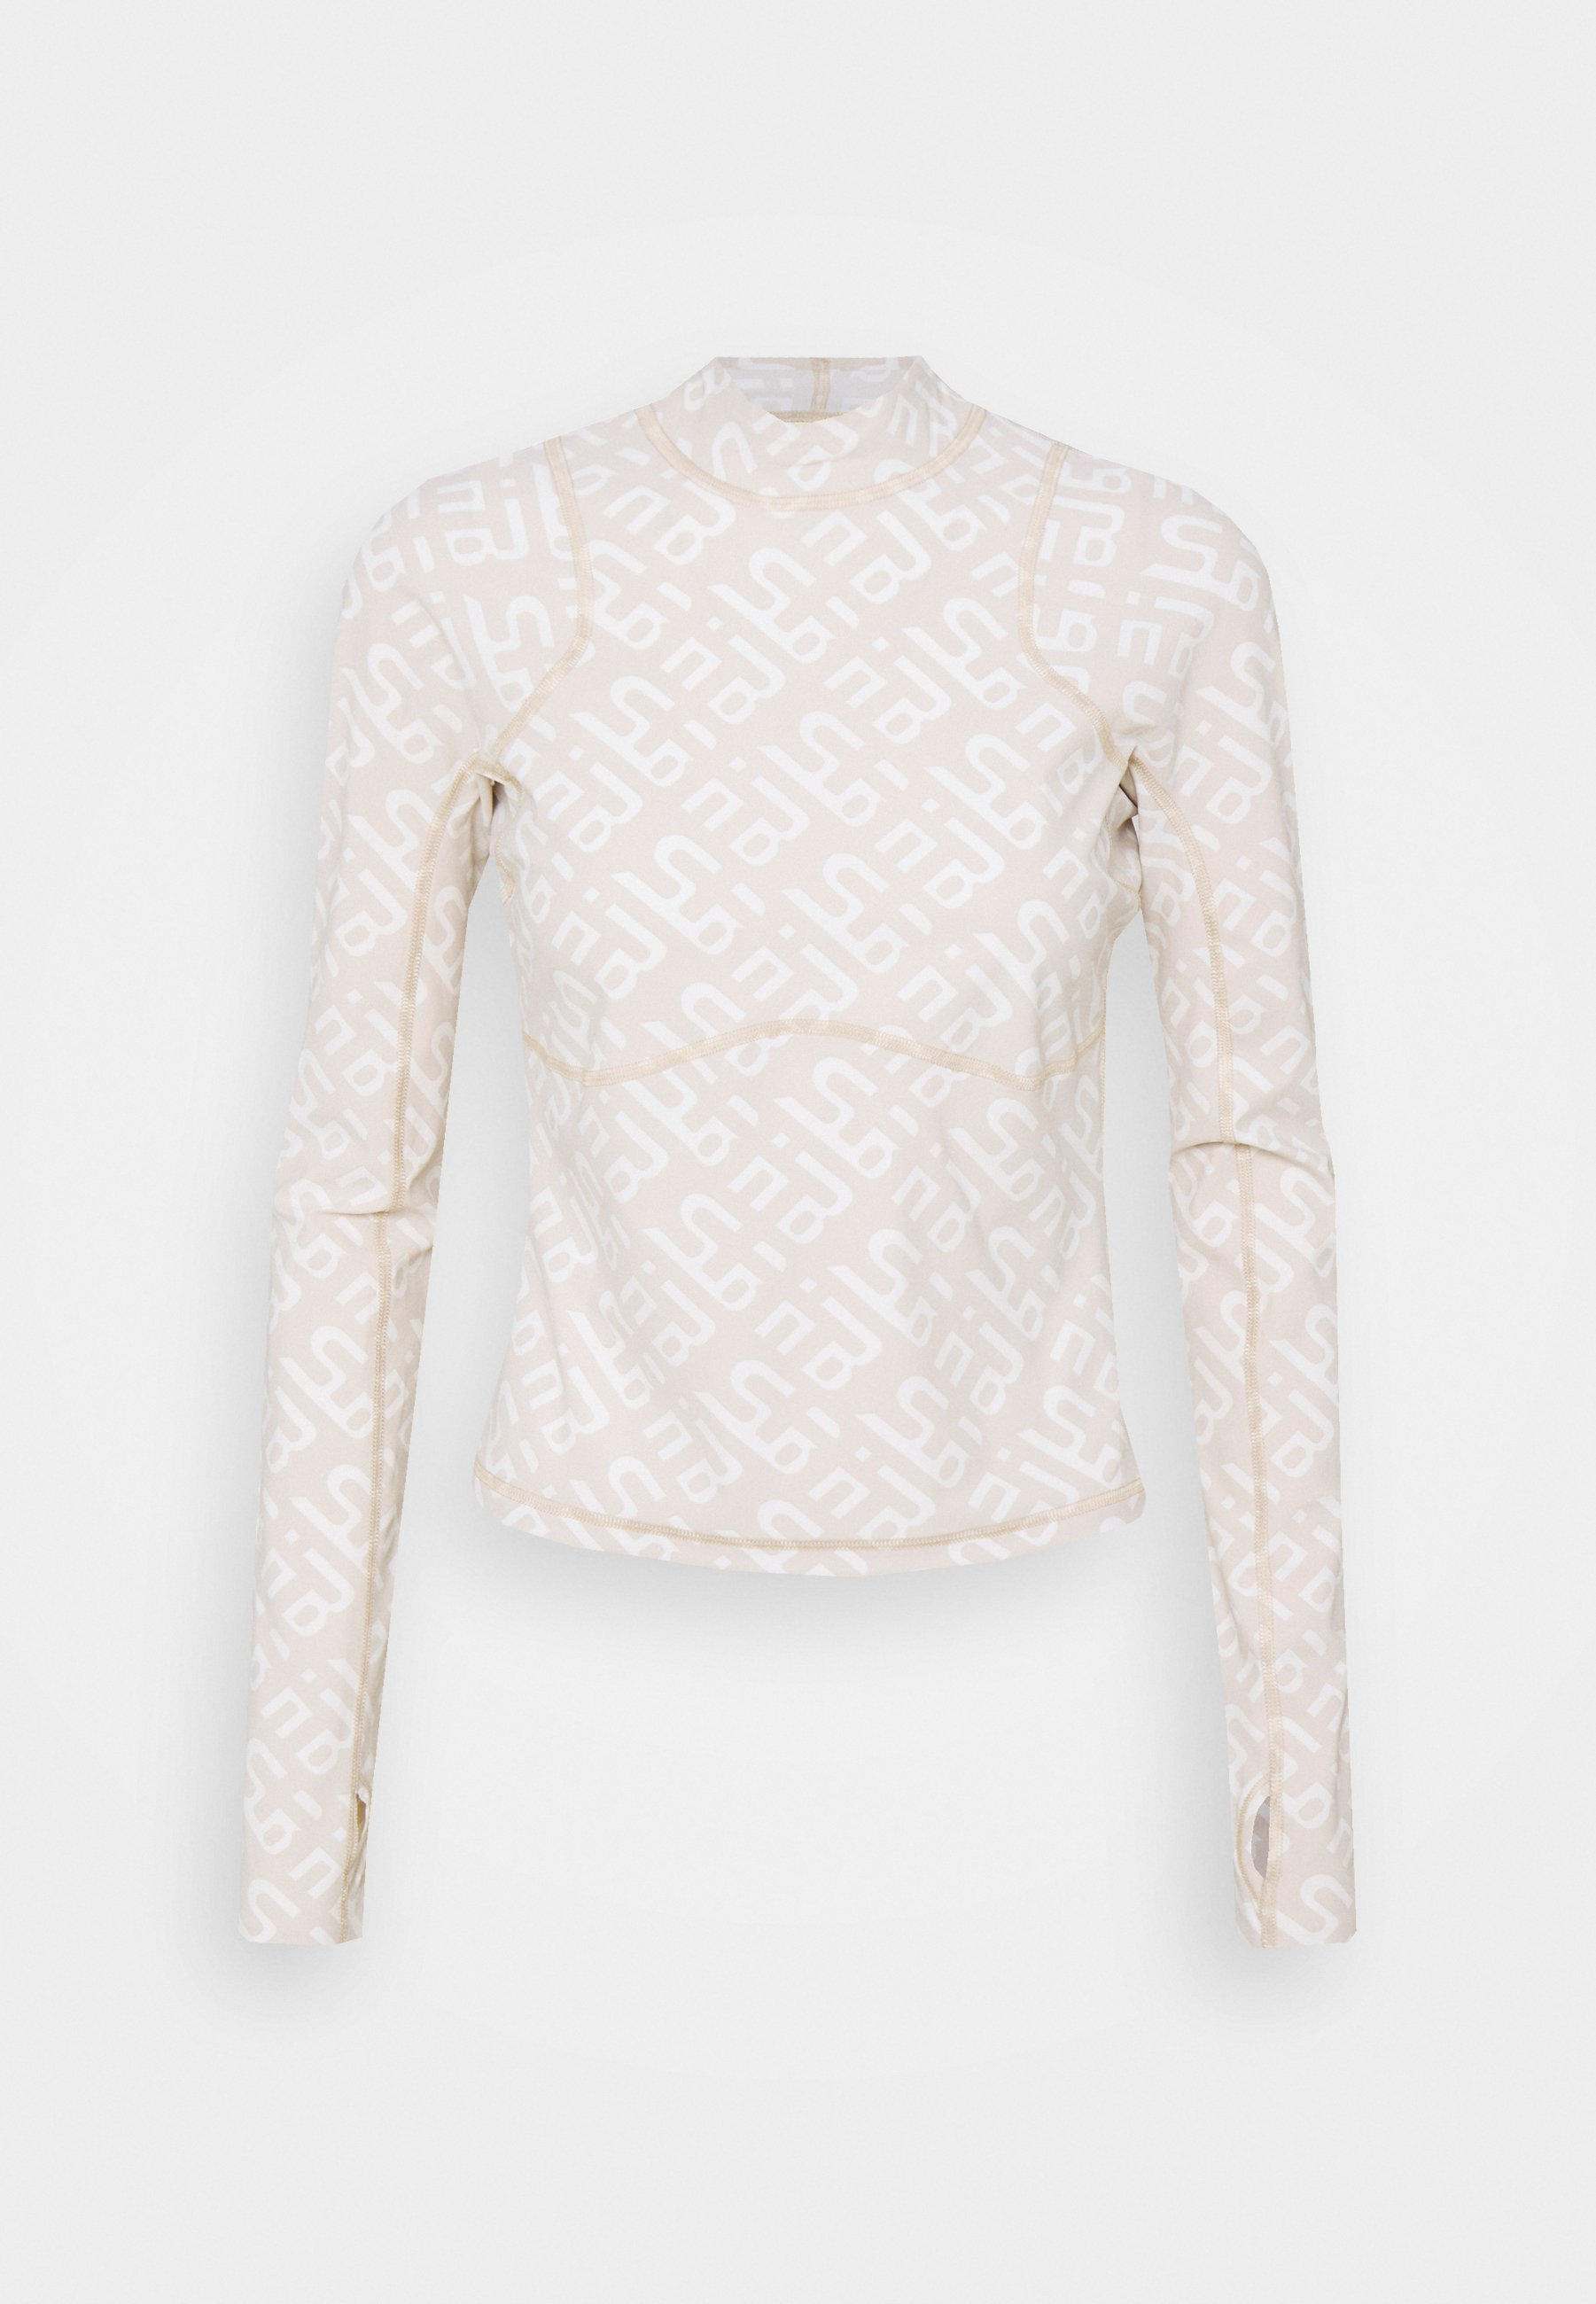 Women SWEATY BETTY X HALLE BERRY SOFIA TRAINING RASH GUARD - Sports shirt - white